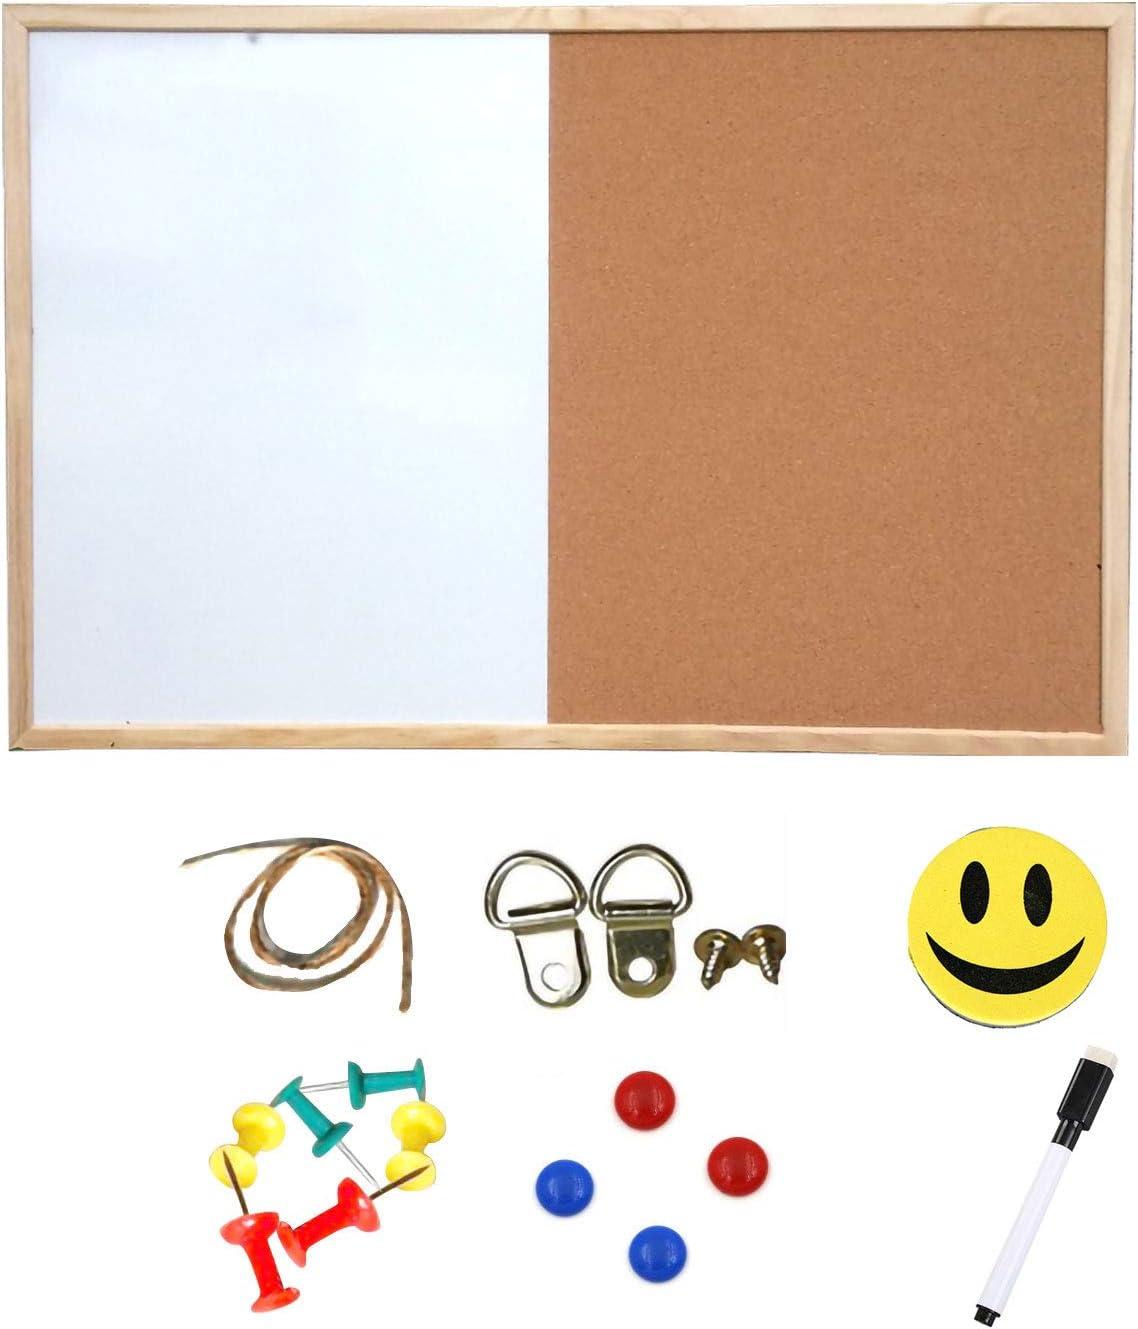 Dry Erase Board and Cork Bulletin Board Combination,11.8x15.7 Inch Combo Whiteboard Cork Message Board for Office Home Decor (S)